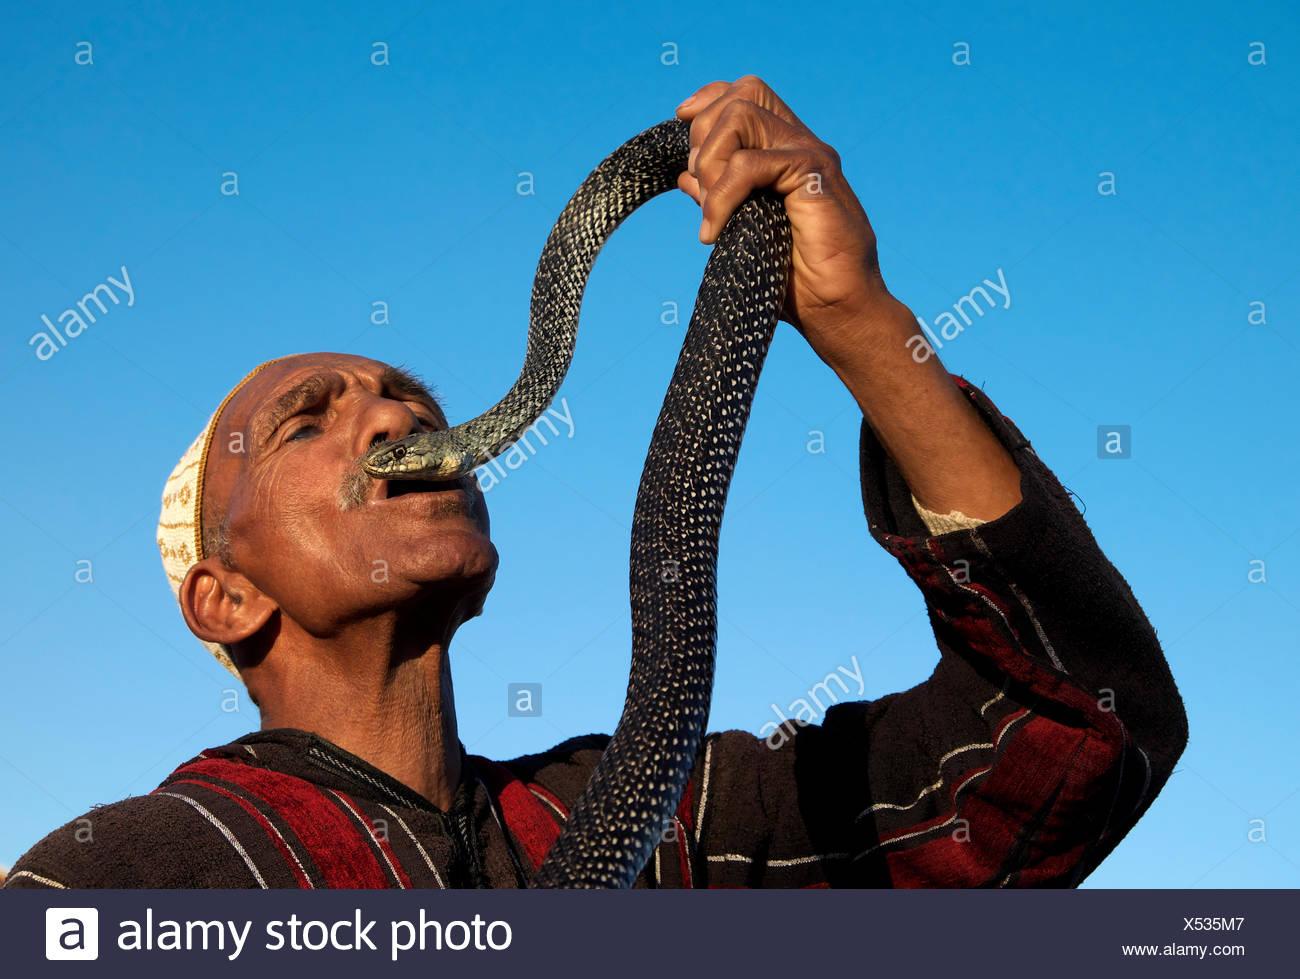 Entertainer holding snake, Marrakech, Marrakech-Tensift-Al Haouz, Morocco - Stock Image